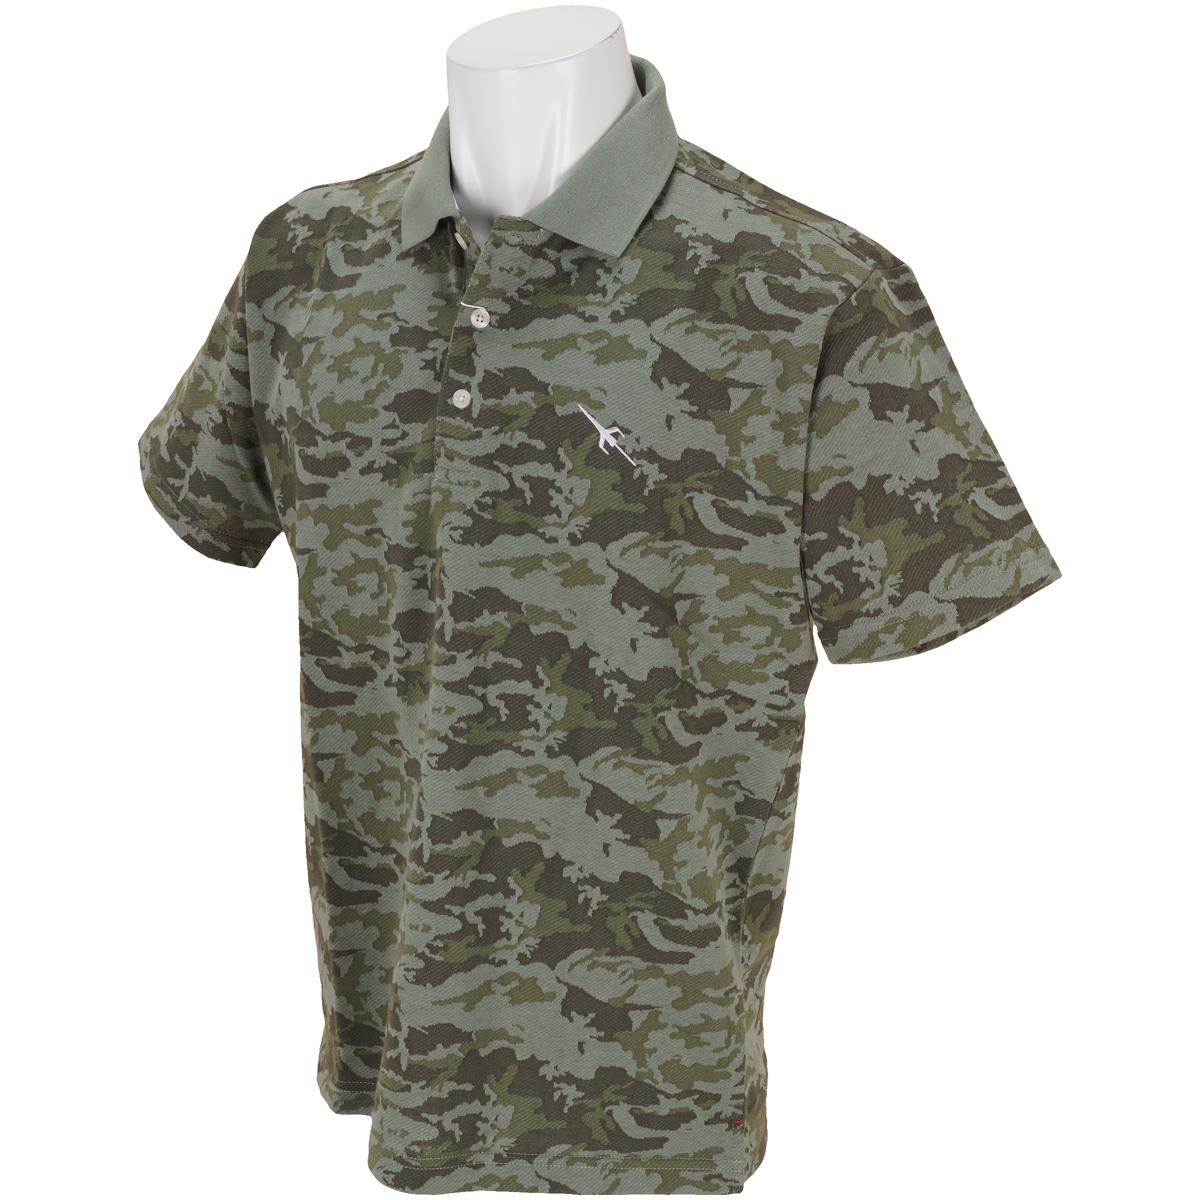 GDO限定 迷彩柄半袖ポロシャツ